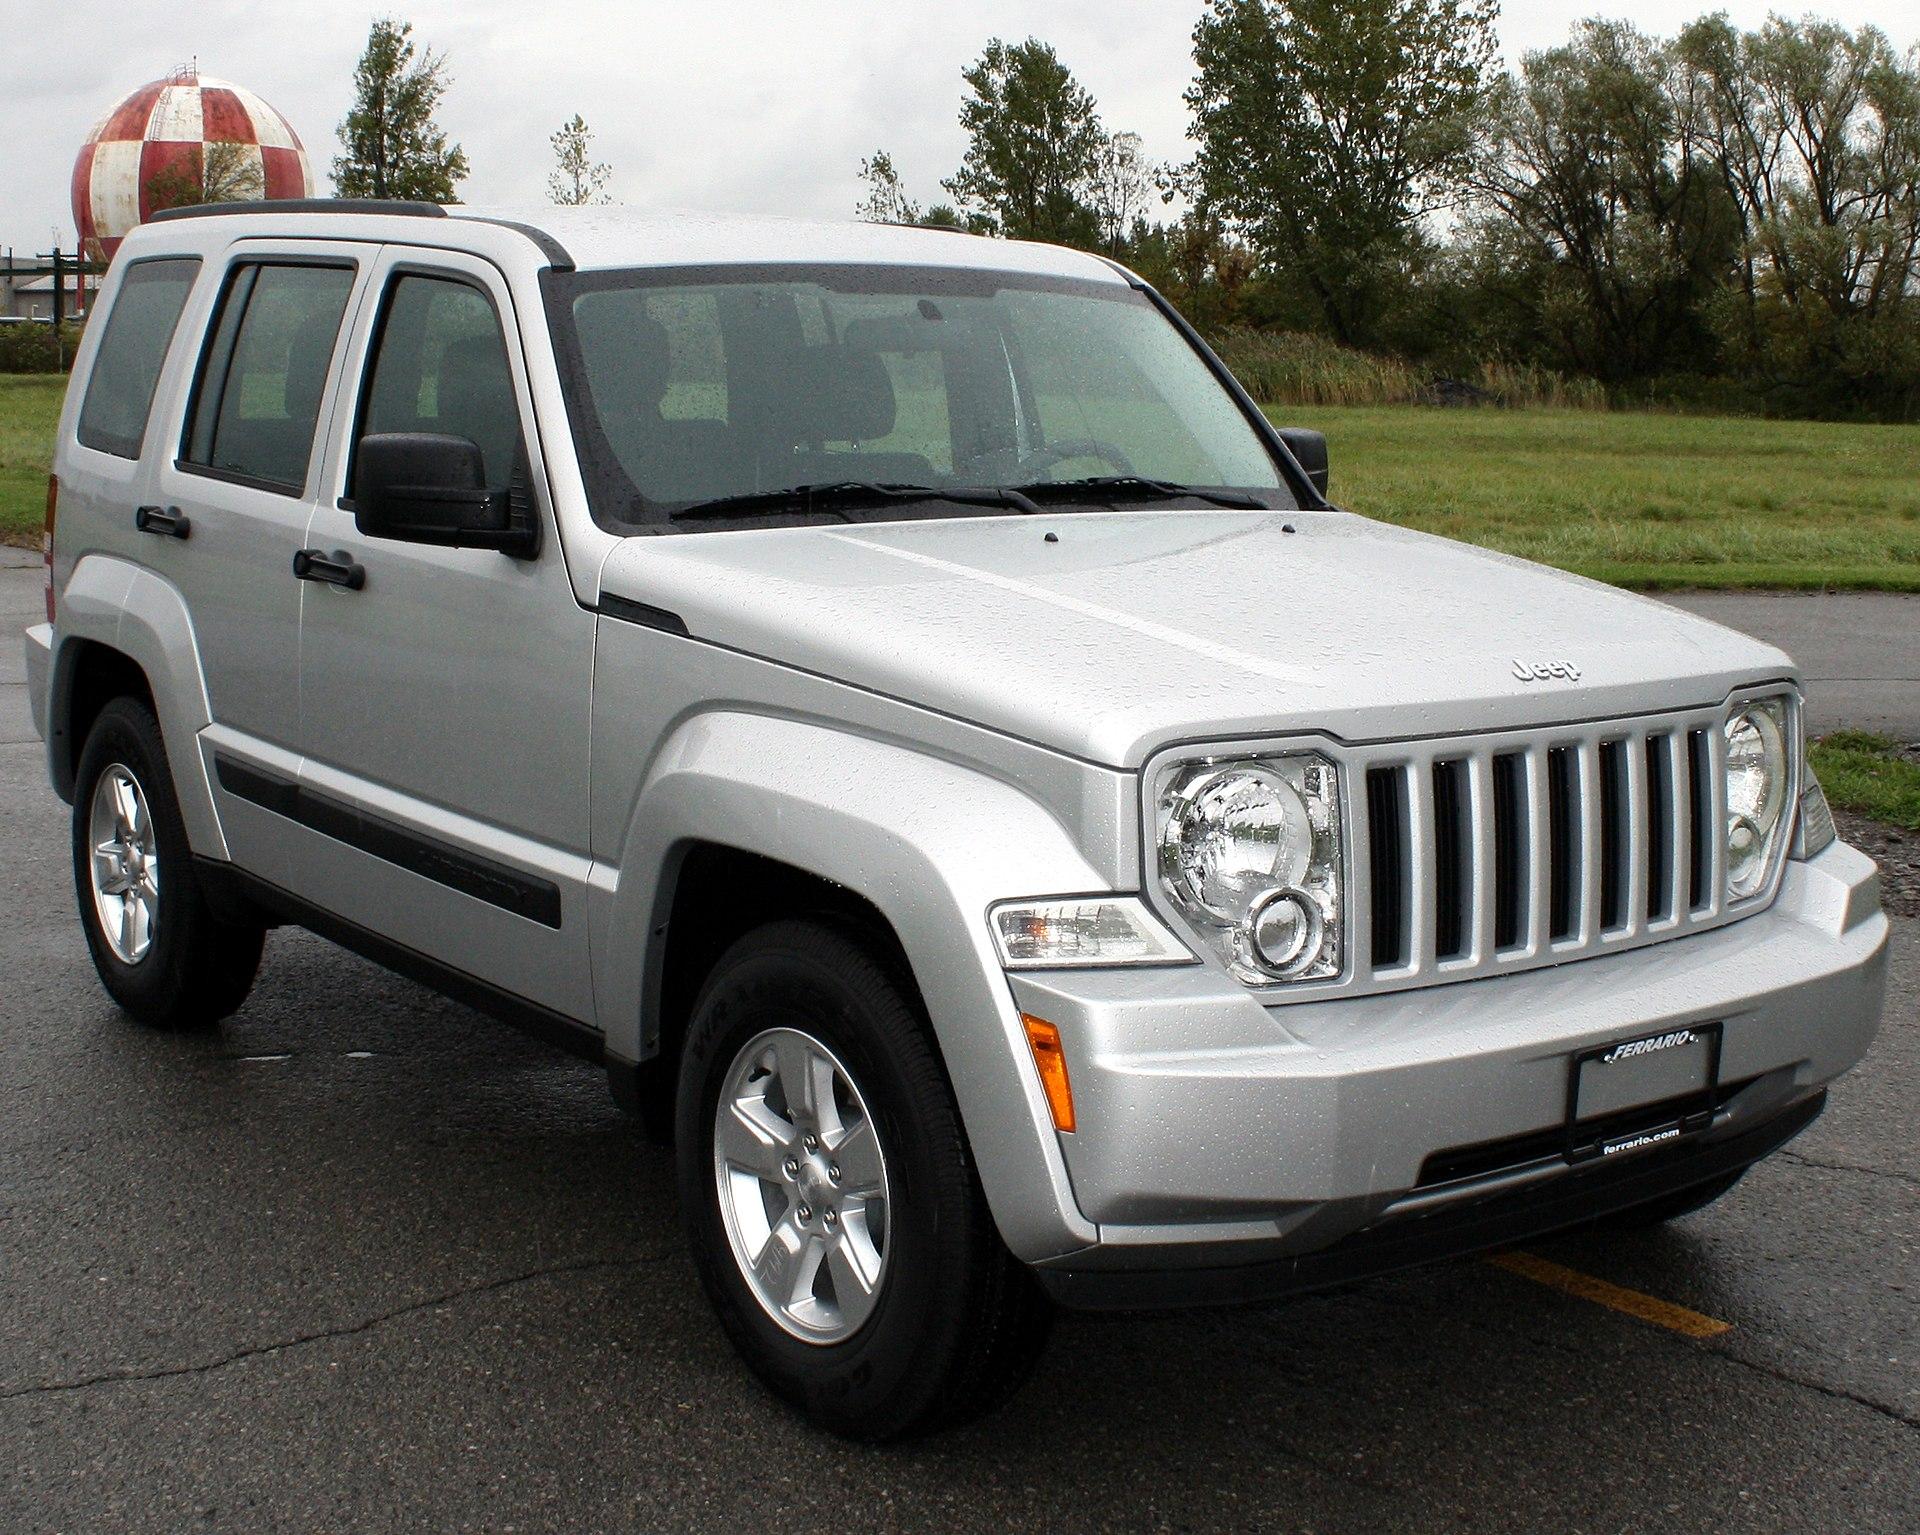 2012 Jeep Liberty for sale in Clarksburg - 1C4PJMAK0CW121521 ...